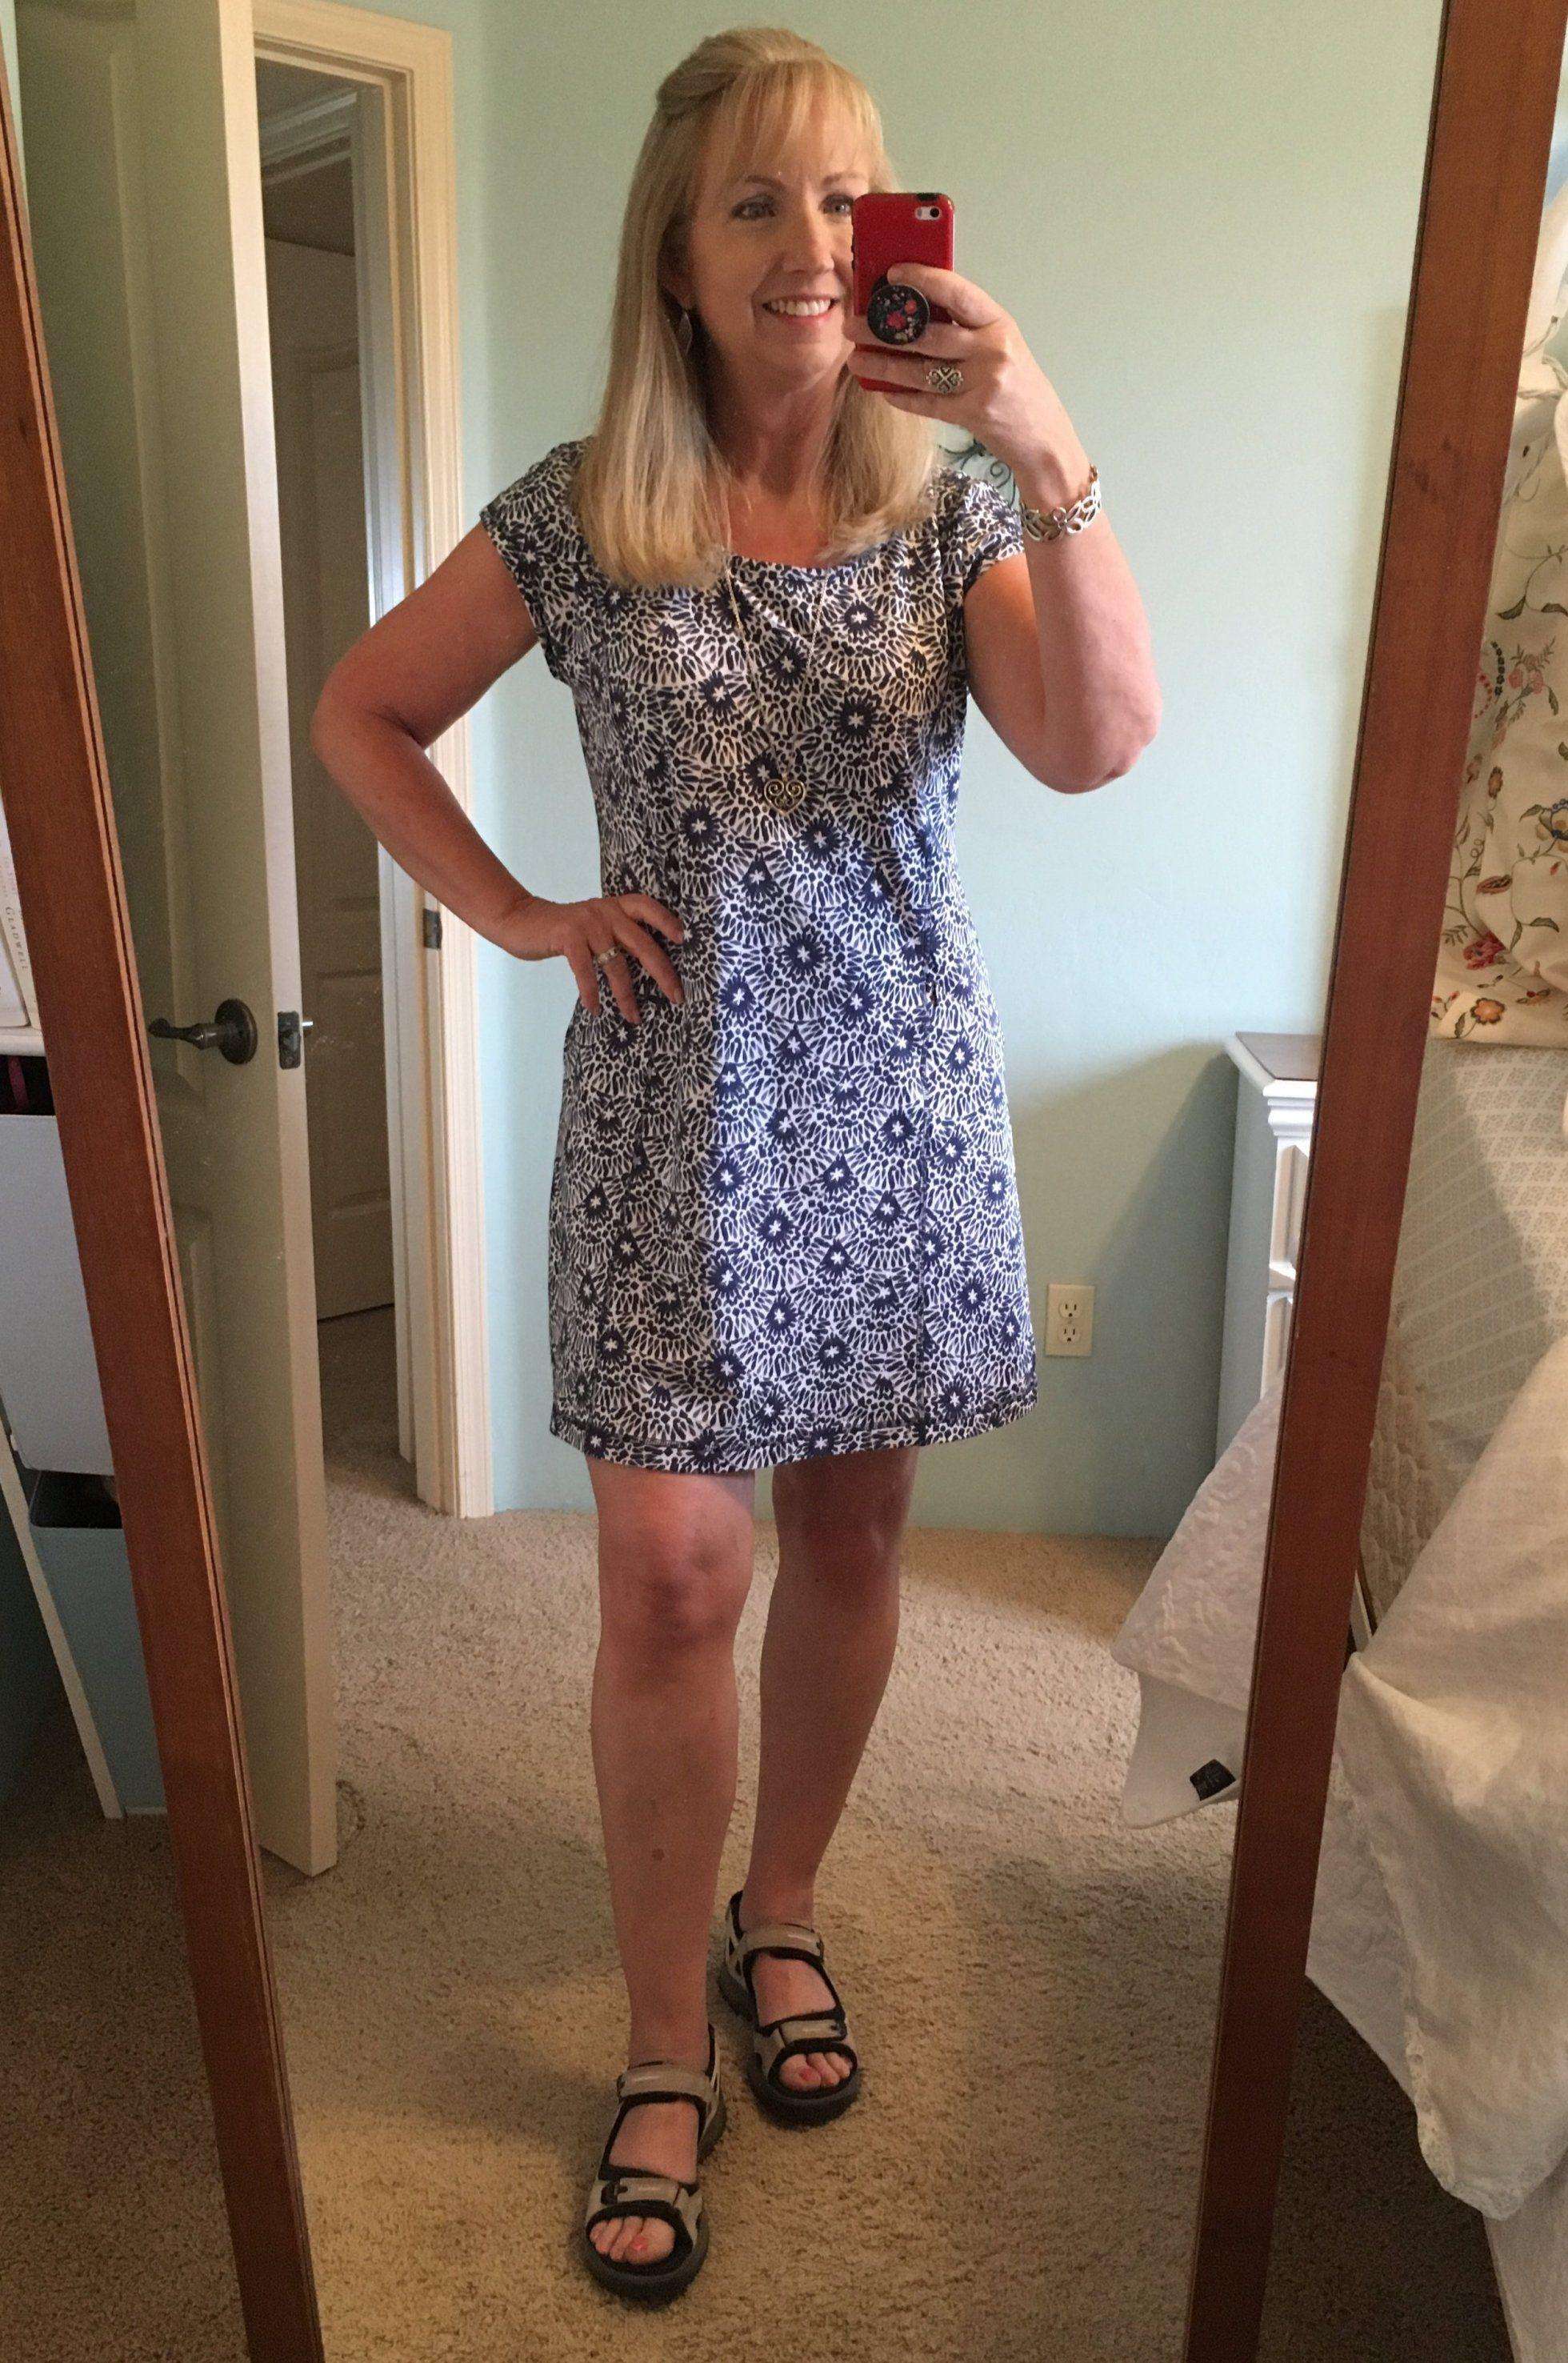 Easy Breezy Summer Dress For Women Over 40 Summer Casual Dress Travel Dress T By Talbots Summer Dresses For Women Summer Dresses Casual Summer Dresses [ 2953 x 1960 Pixel ]